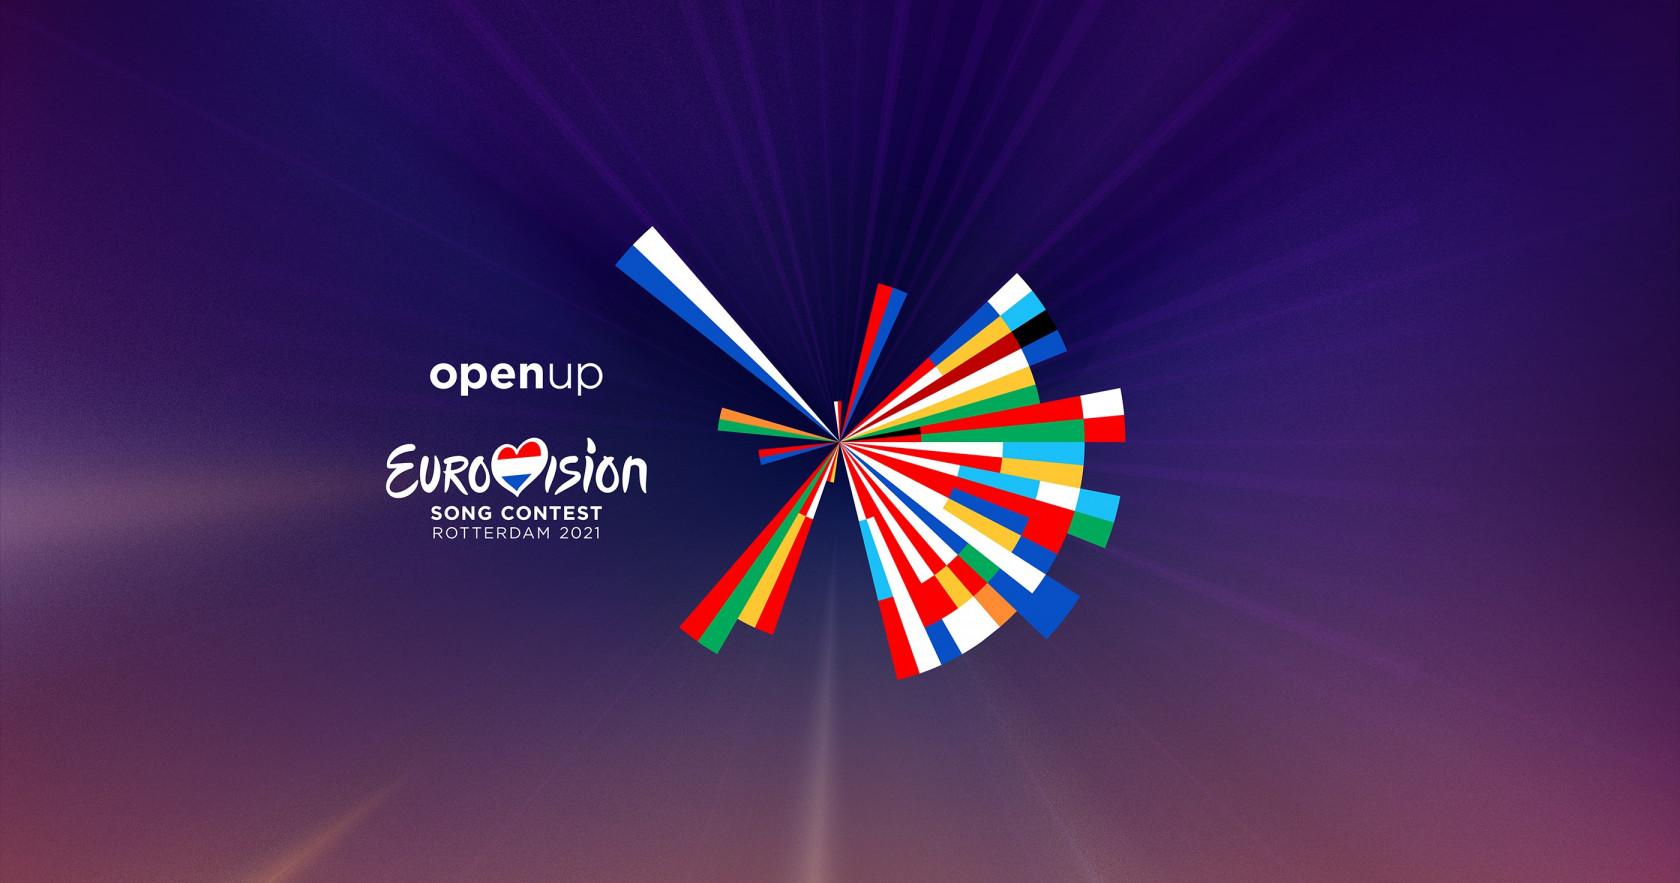 Eurovisie Songfestival 2021